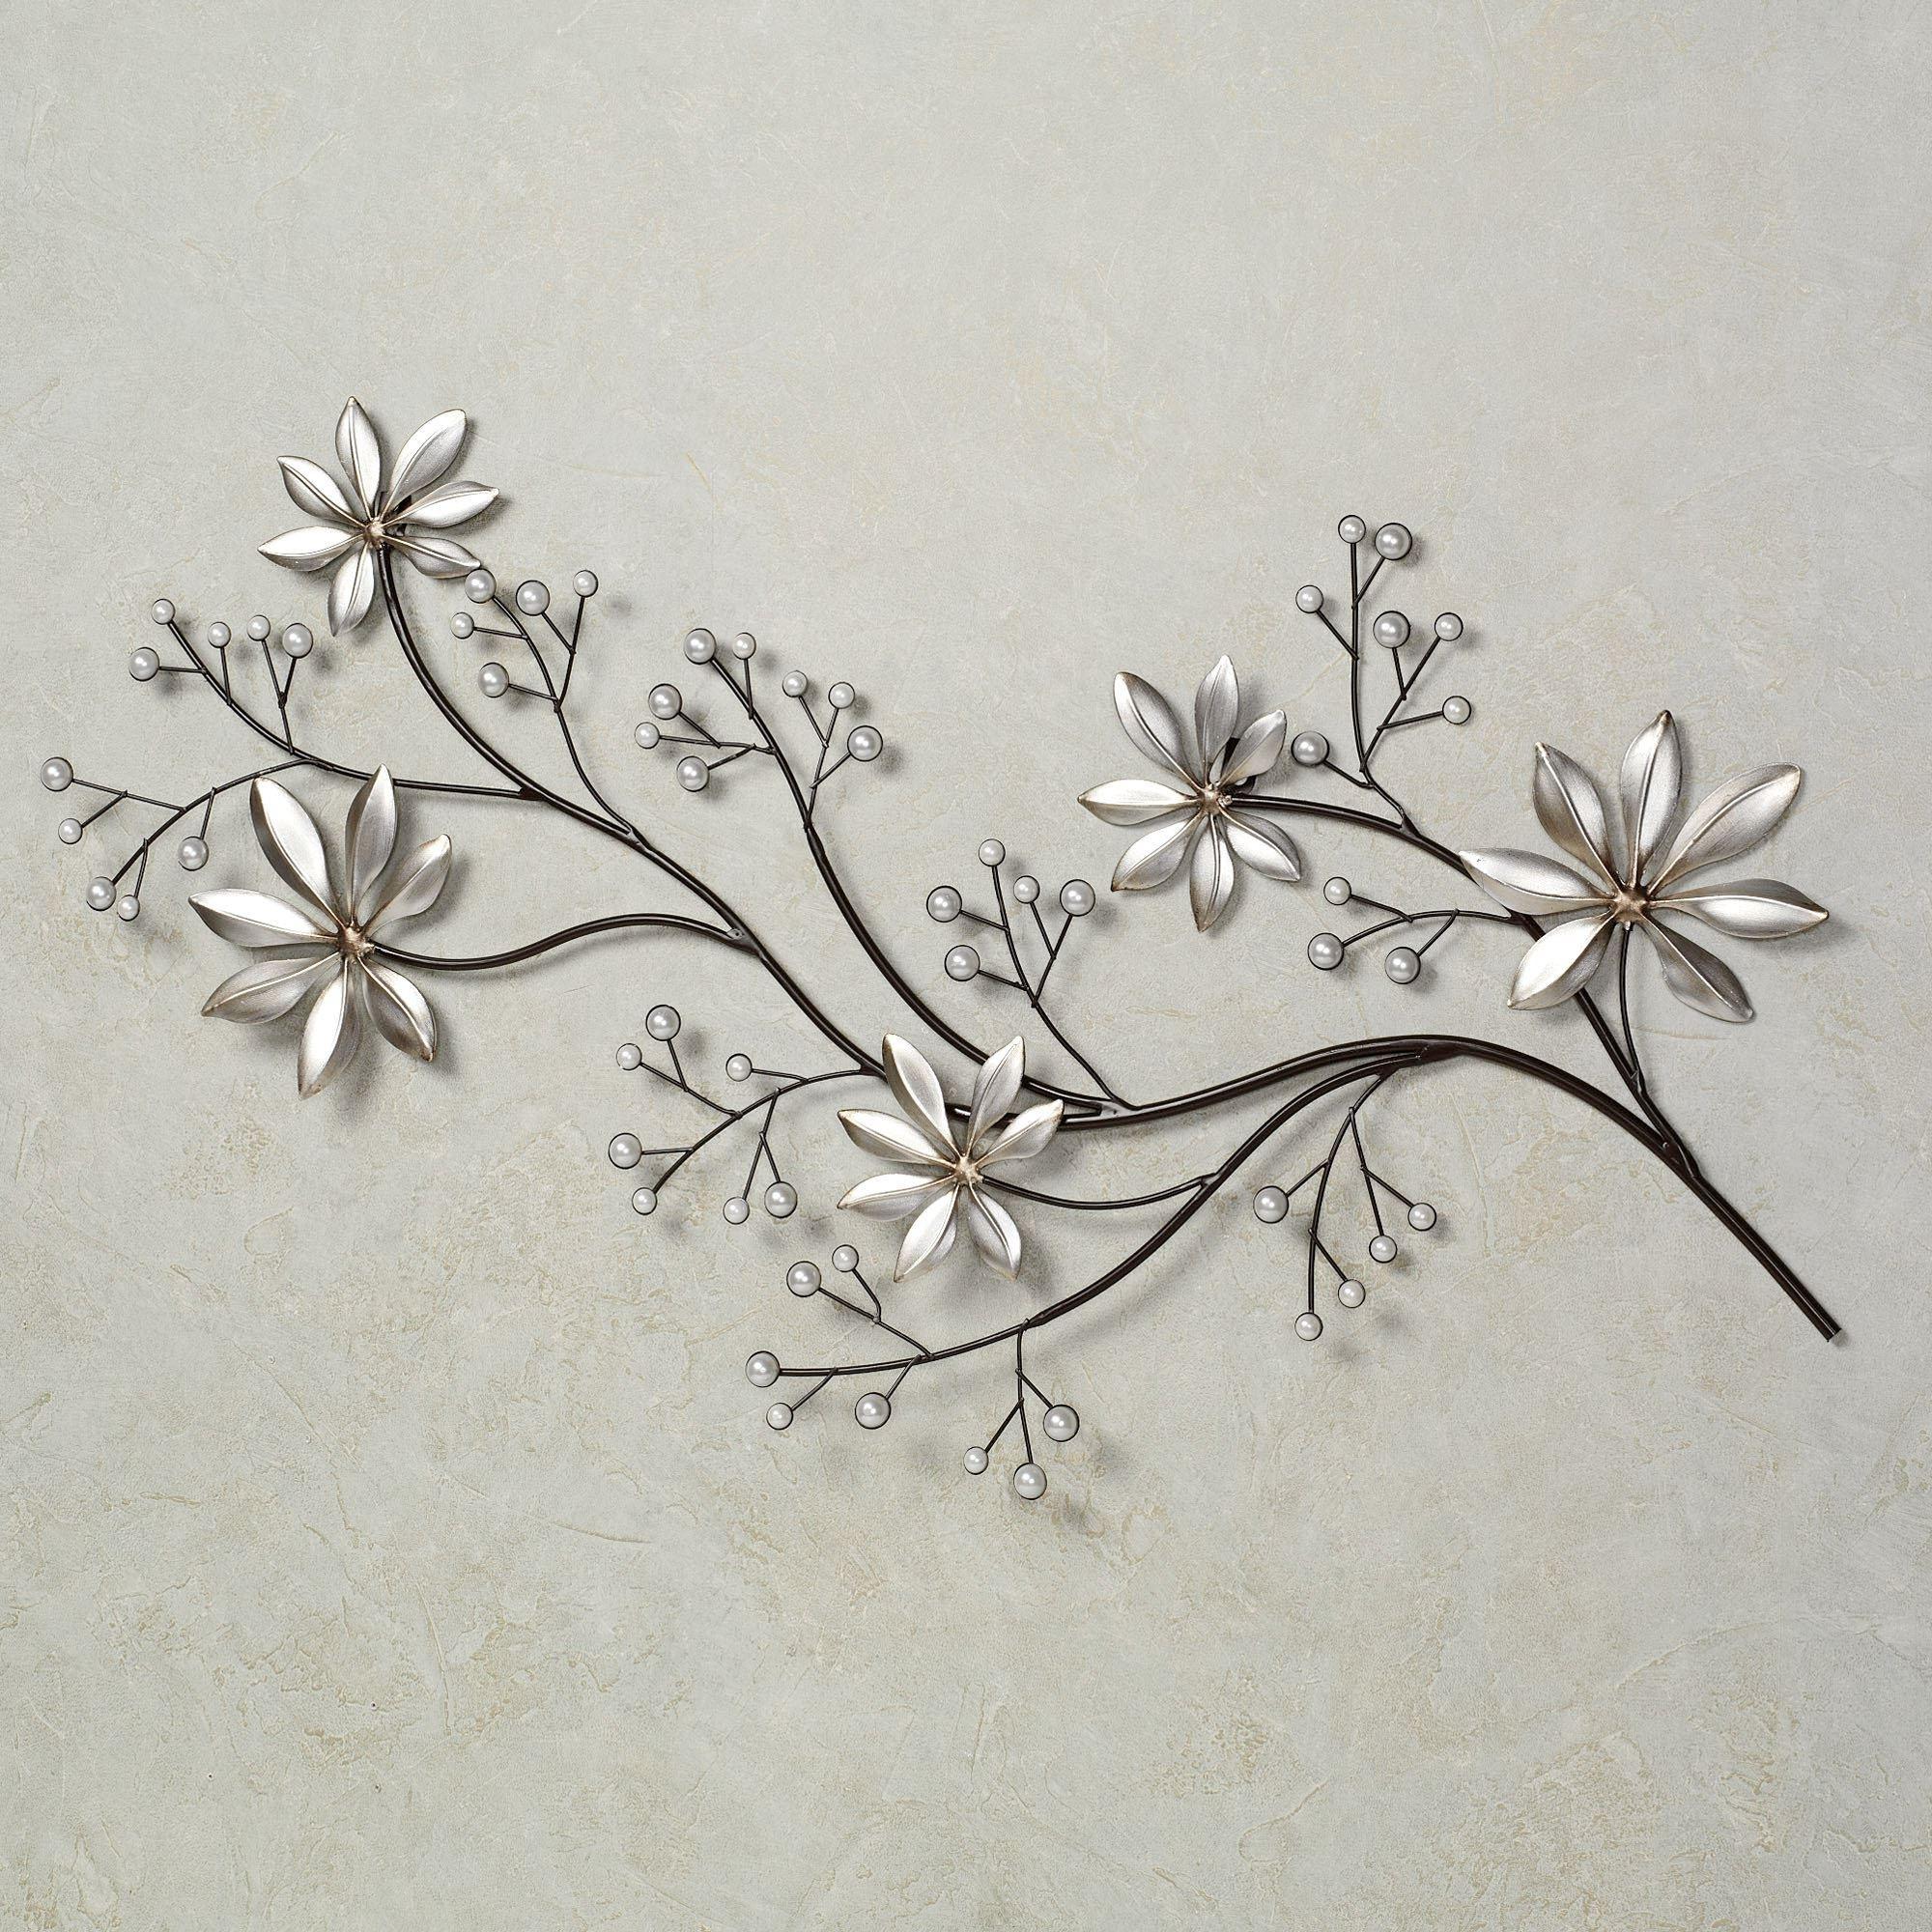 Famous Metal Flower Wall Art Regarding Lovely Metal Flower Wall Art – Kunuzmetals (View 5 of 15)